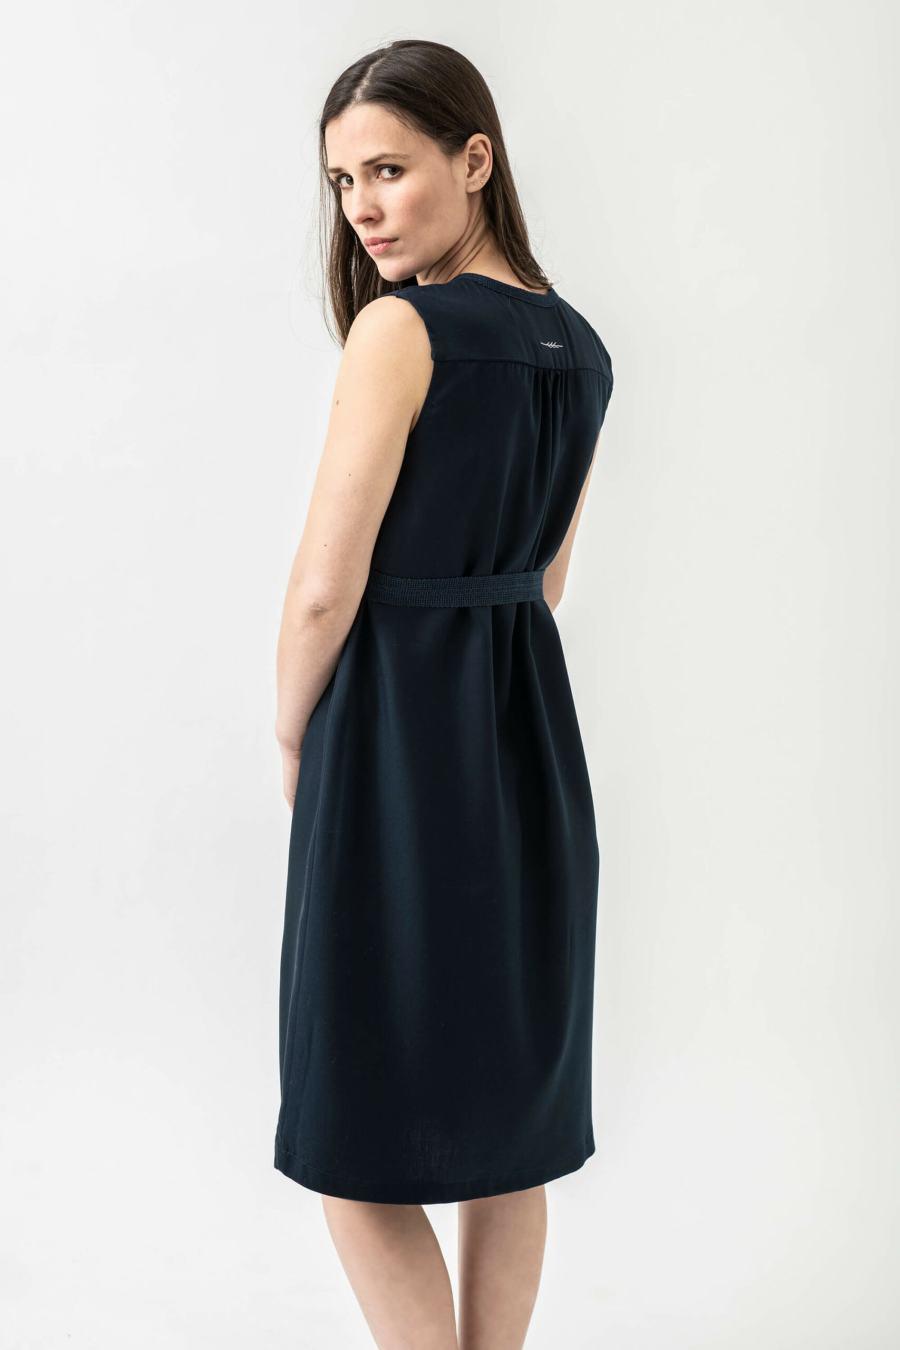 Kleid Emilia von Grenz/gang Slow & Organic Fashion